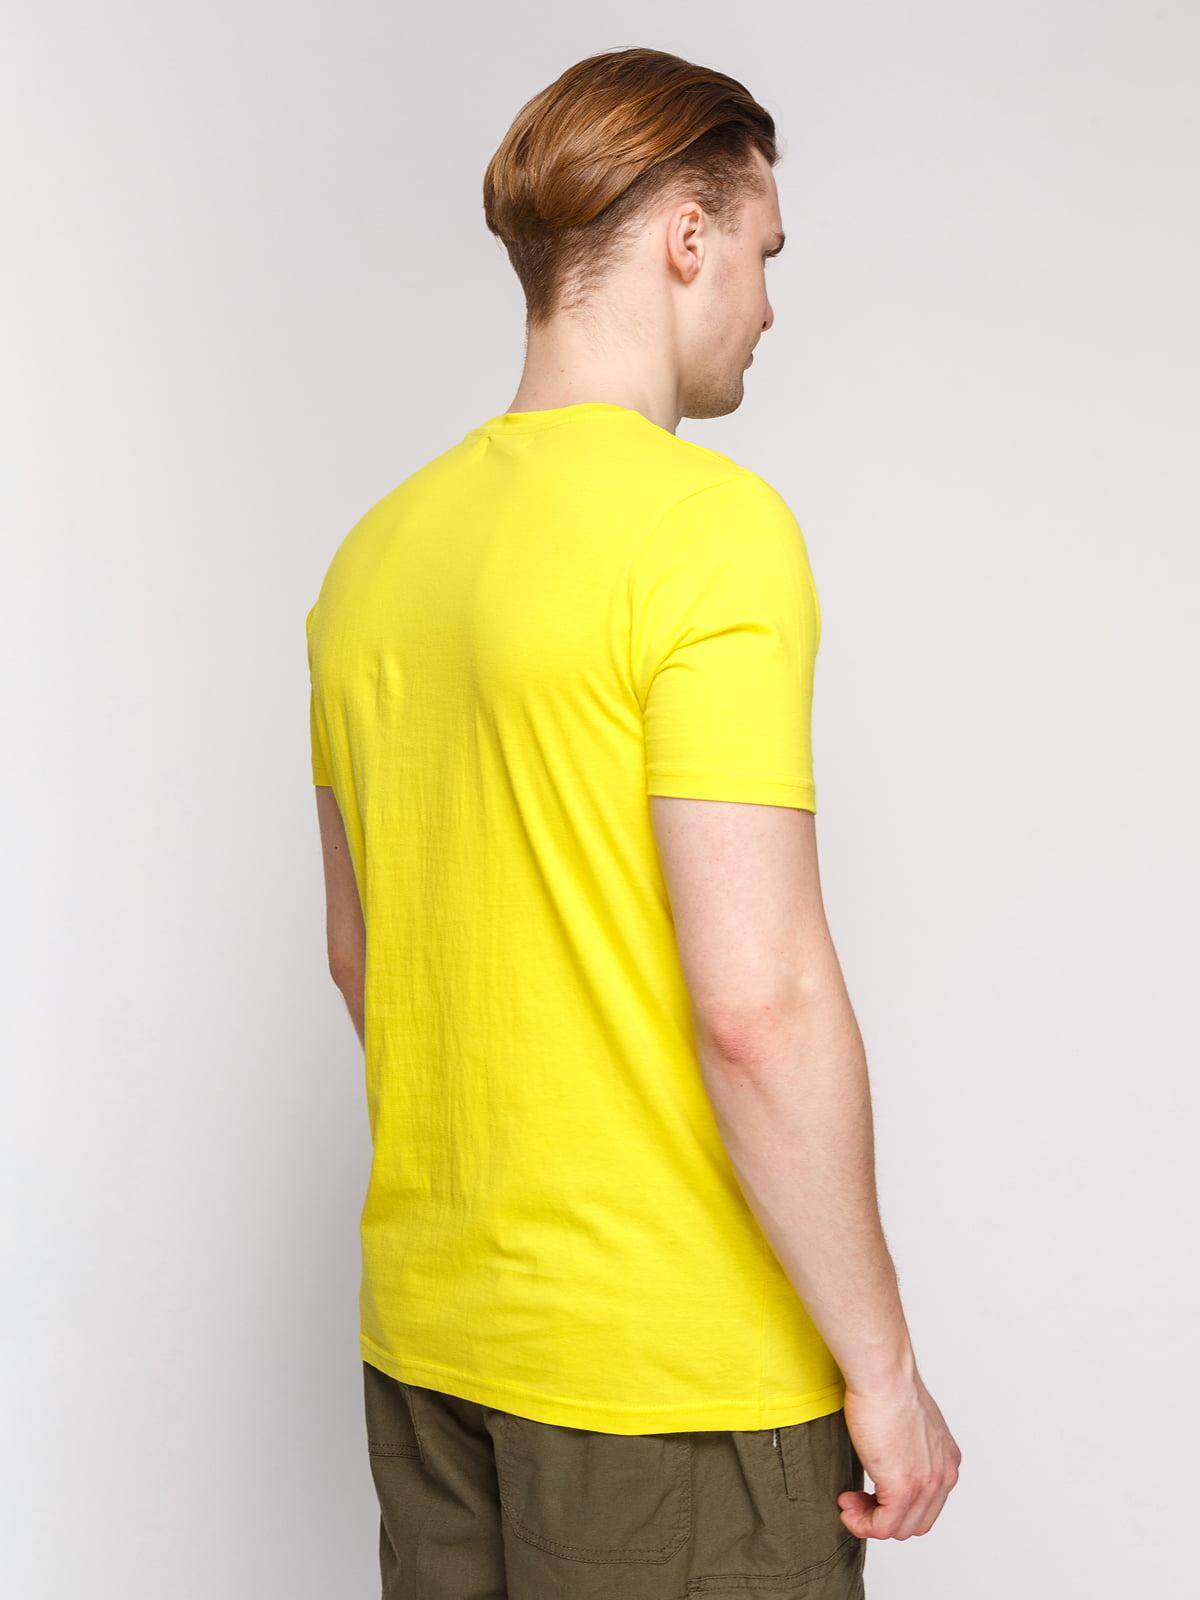 Футболка жовта з принтом | 4854936 | фото 2